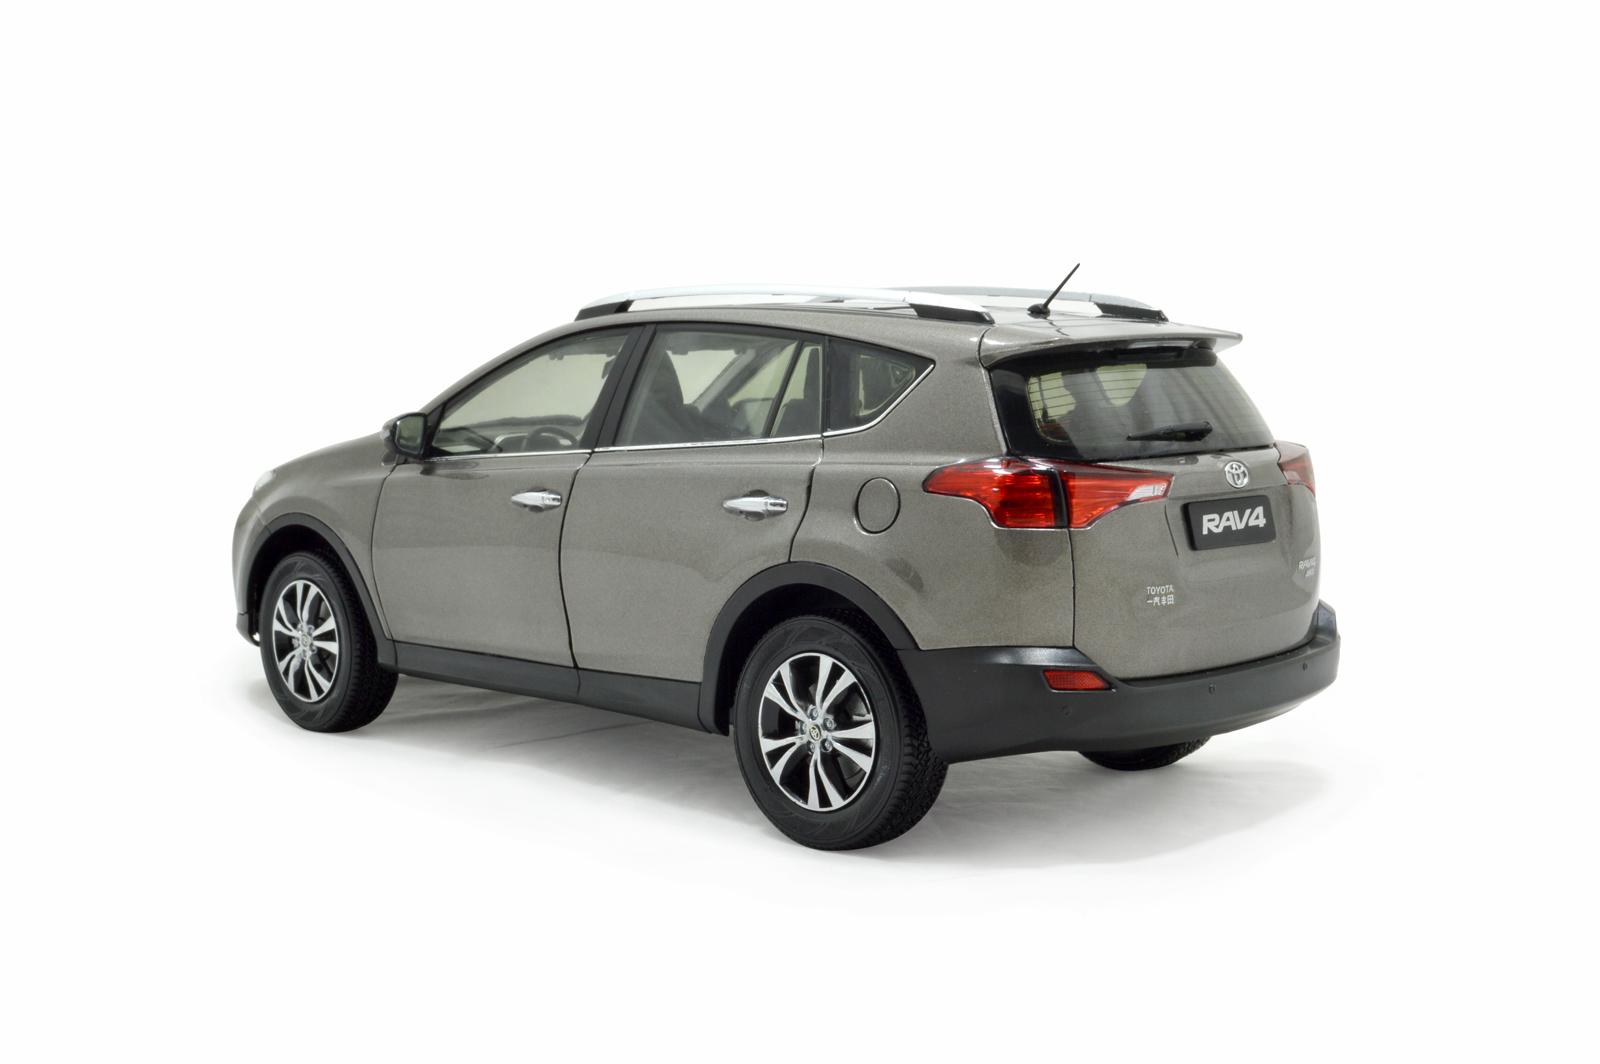 Toyota Rav4 2014 1 18 Scale Diecast Model Car Wholesale